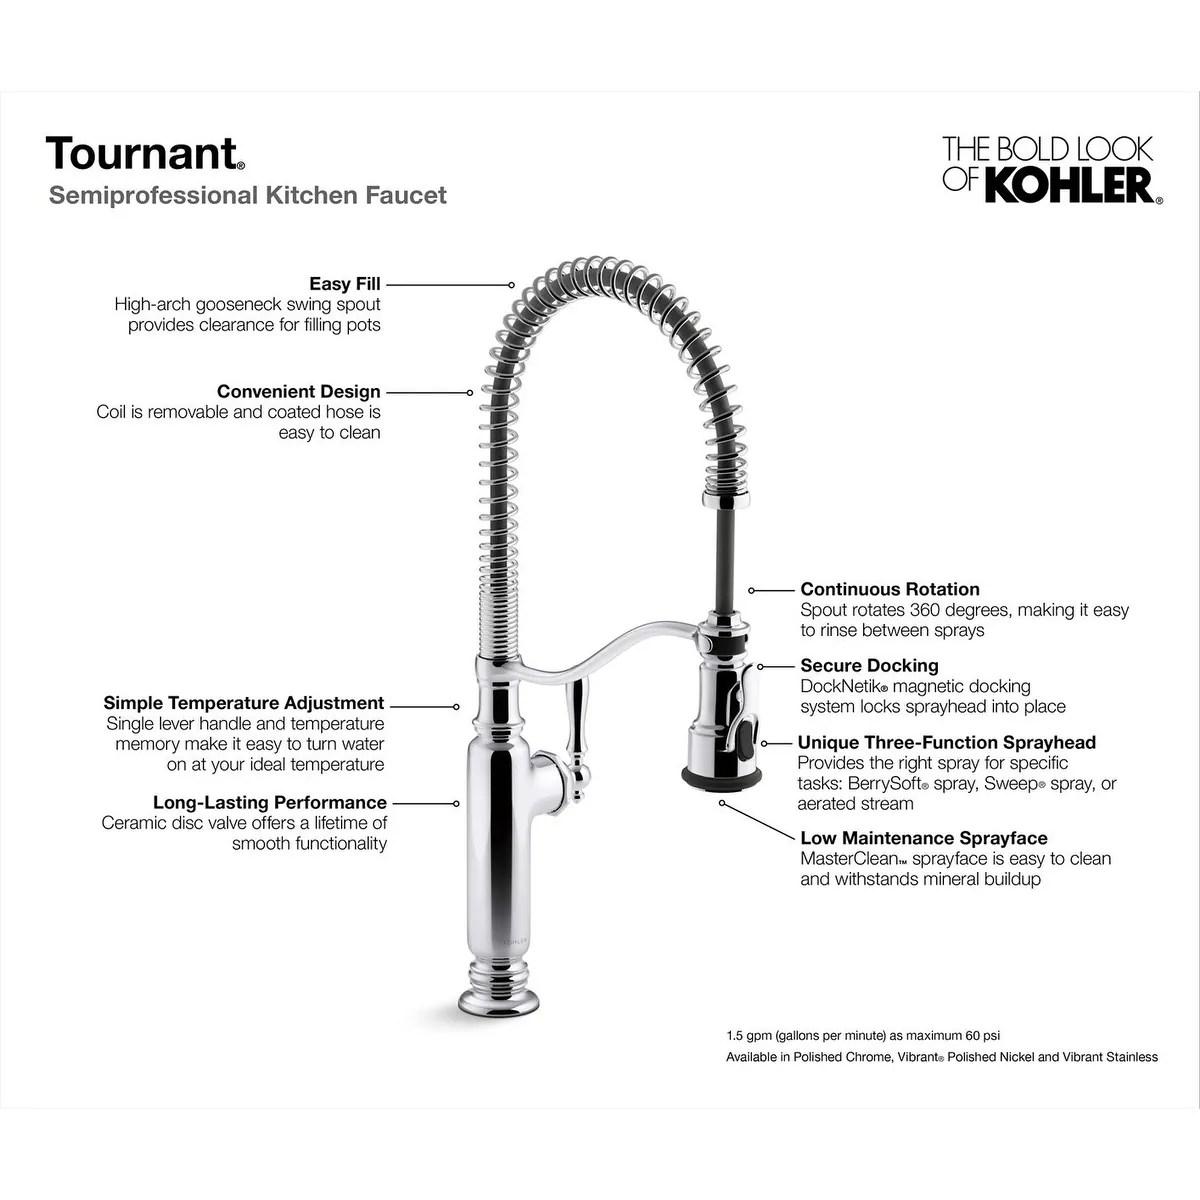 kohler tournant semiprofessional kitchen sink faucet